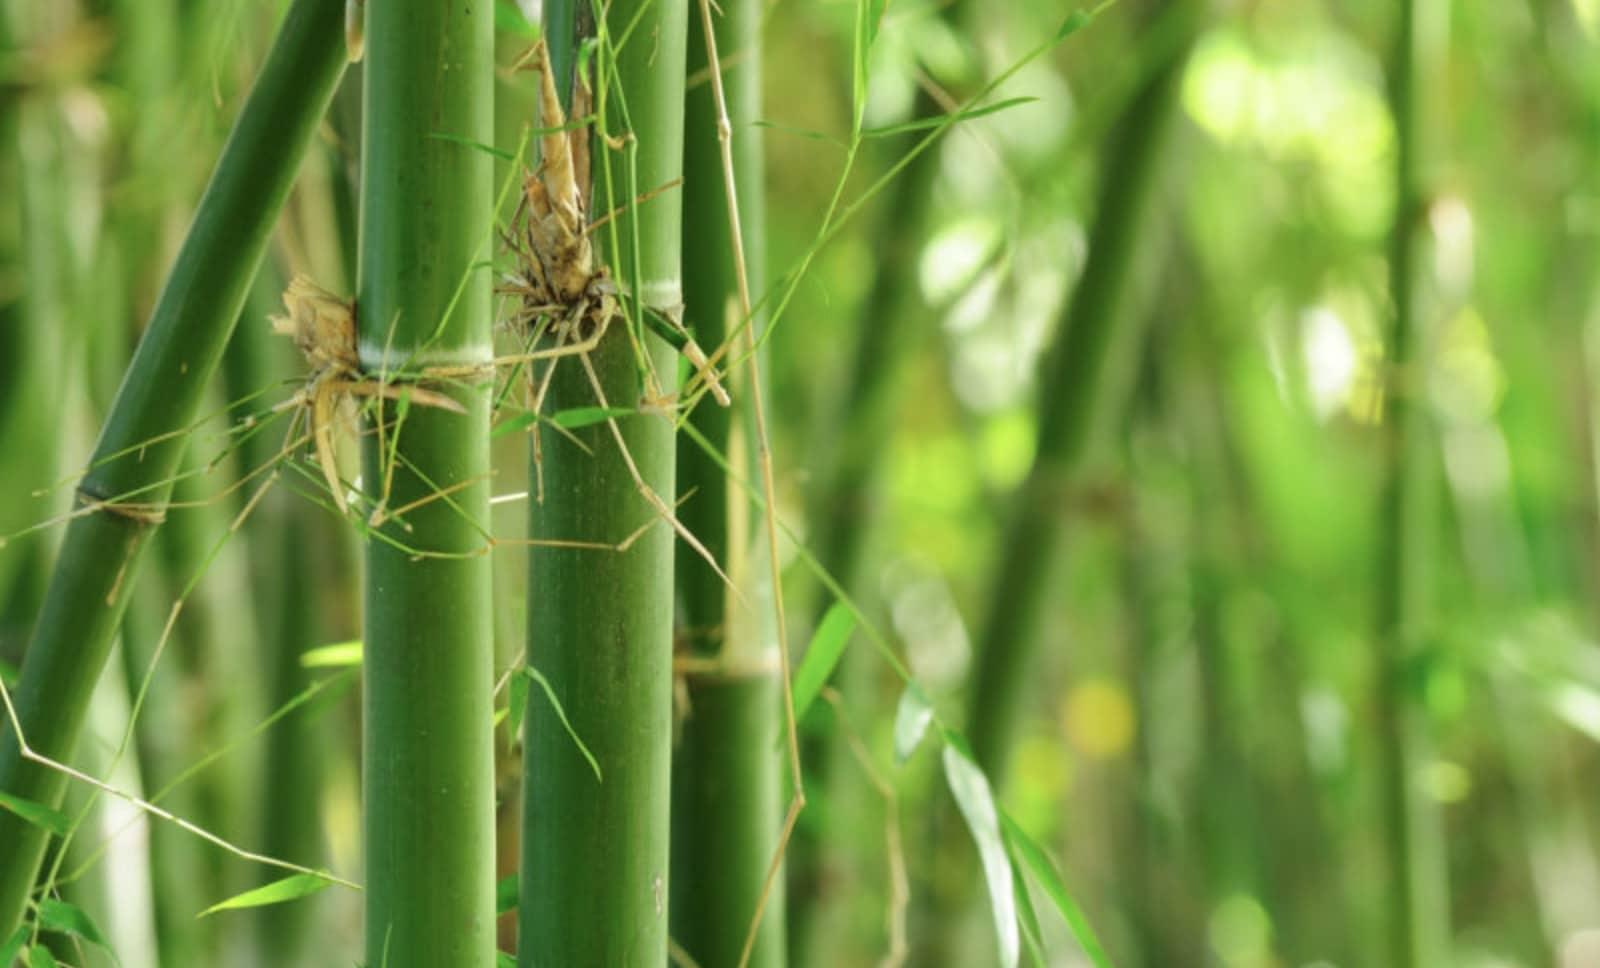 Bamboo is environmentally friendly